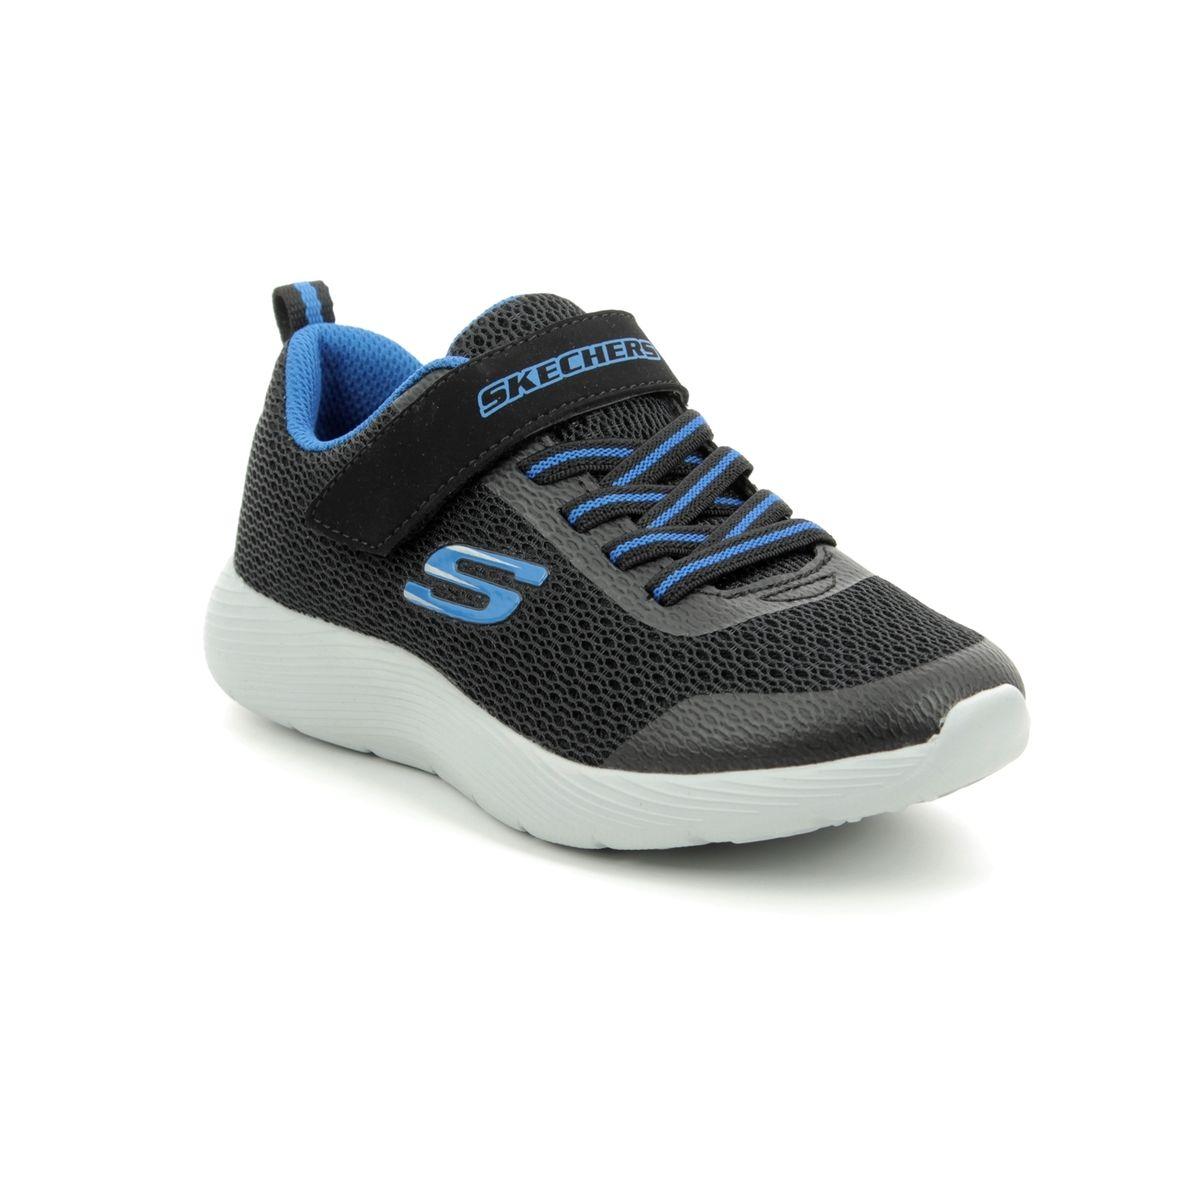 0778fe15d6 Skechers Dyna-lite 98120 BKRY Black Royal combi trainers